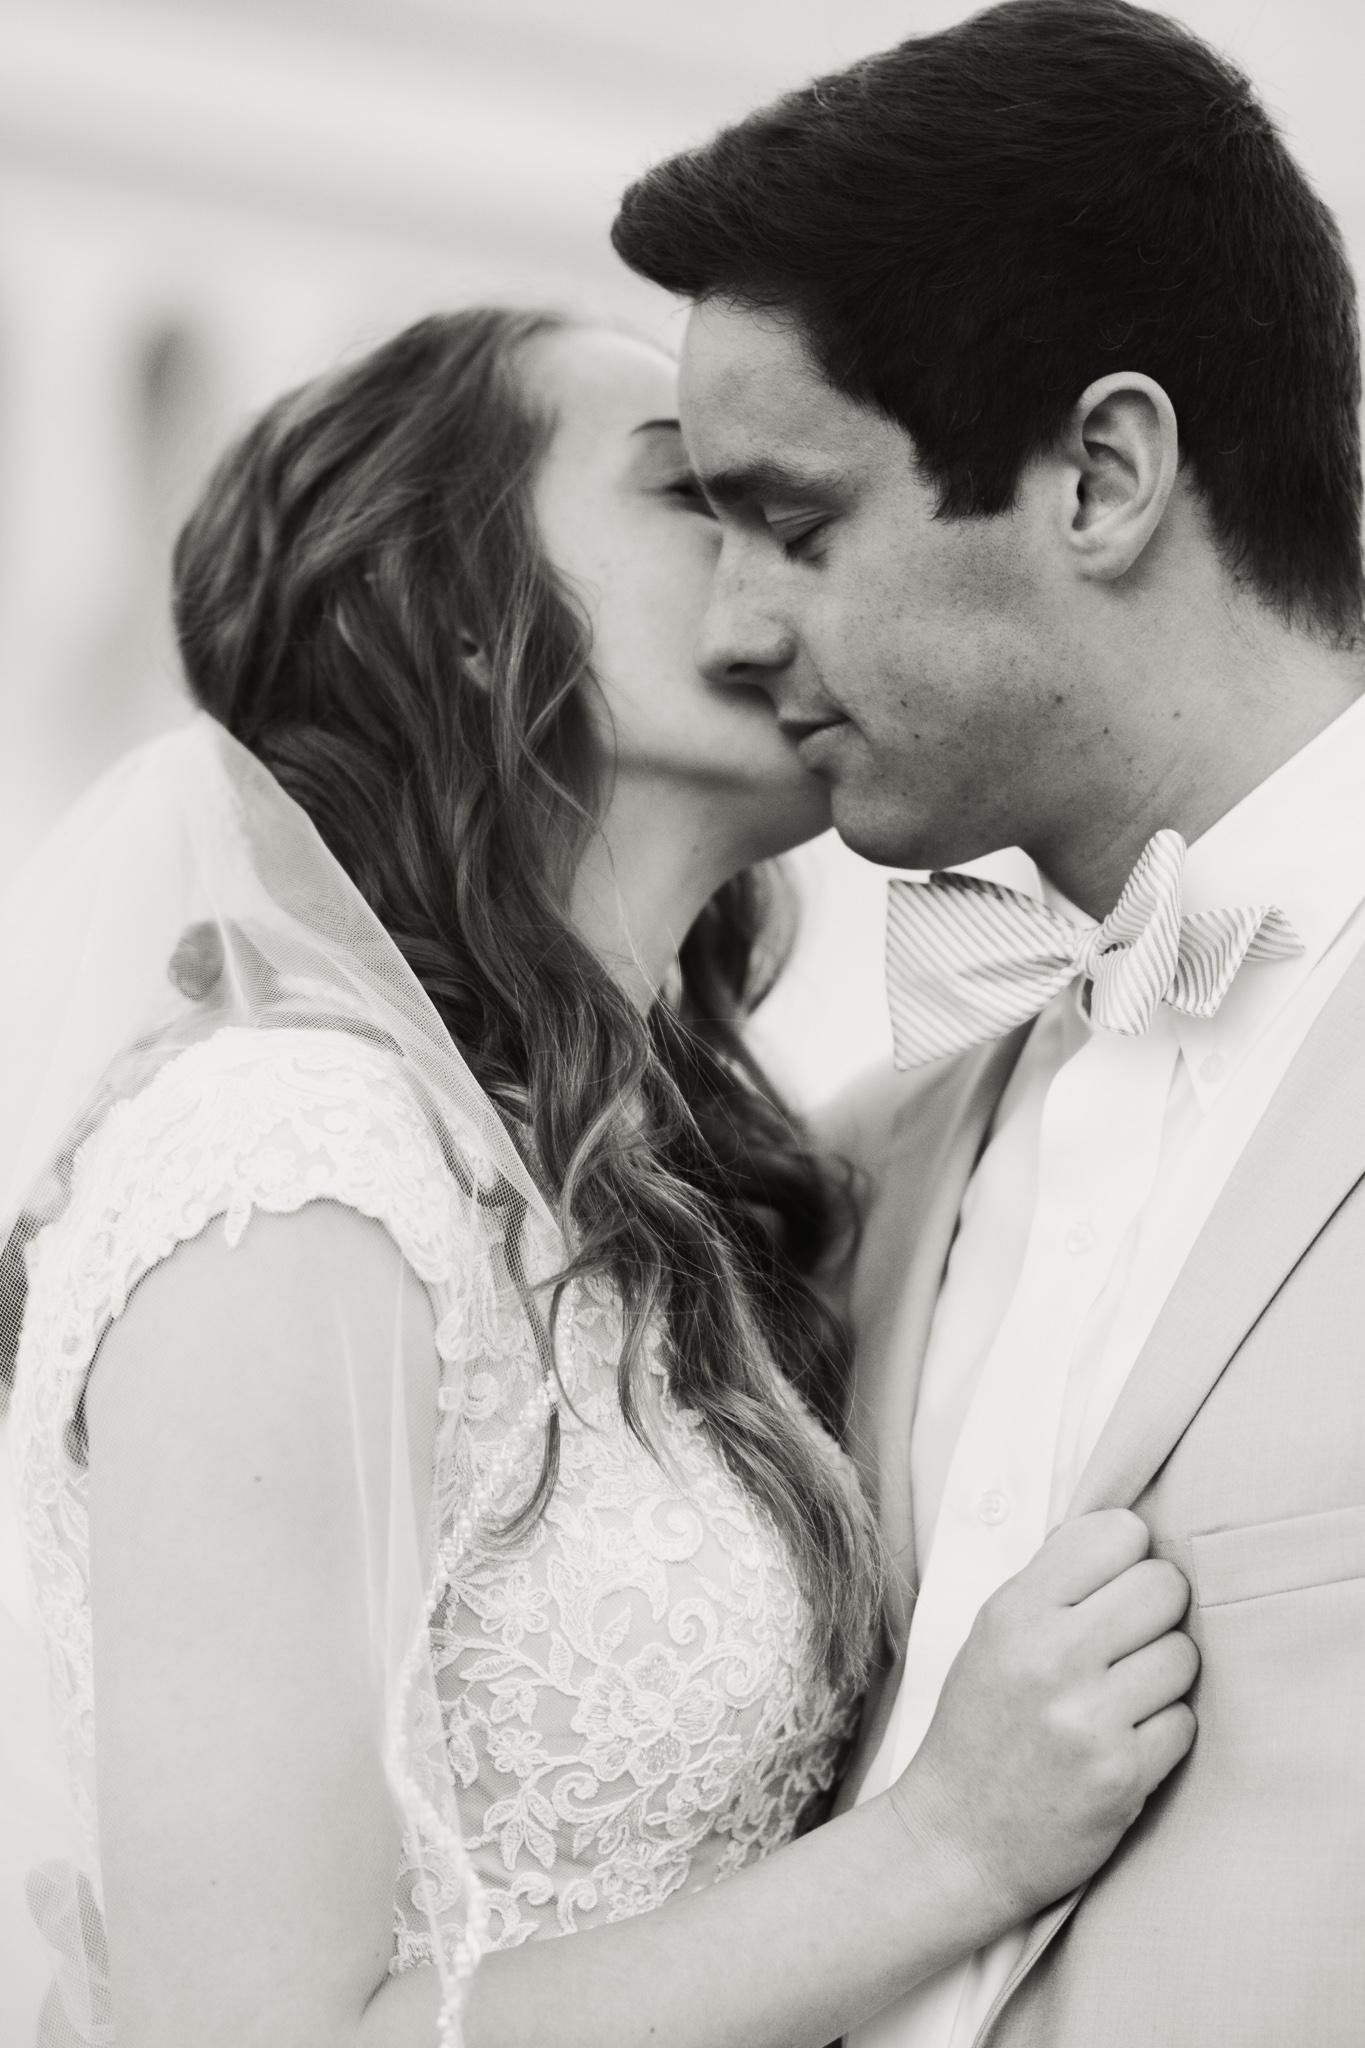 ss-photography-design-boise-idaho-wedding-and-senior-photographer-and-graphic-designer